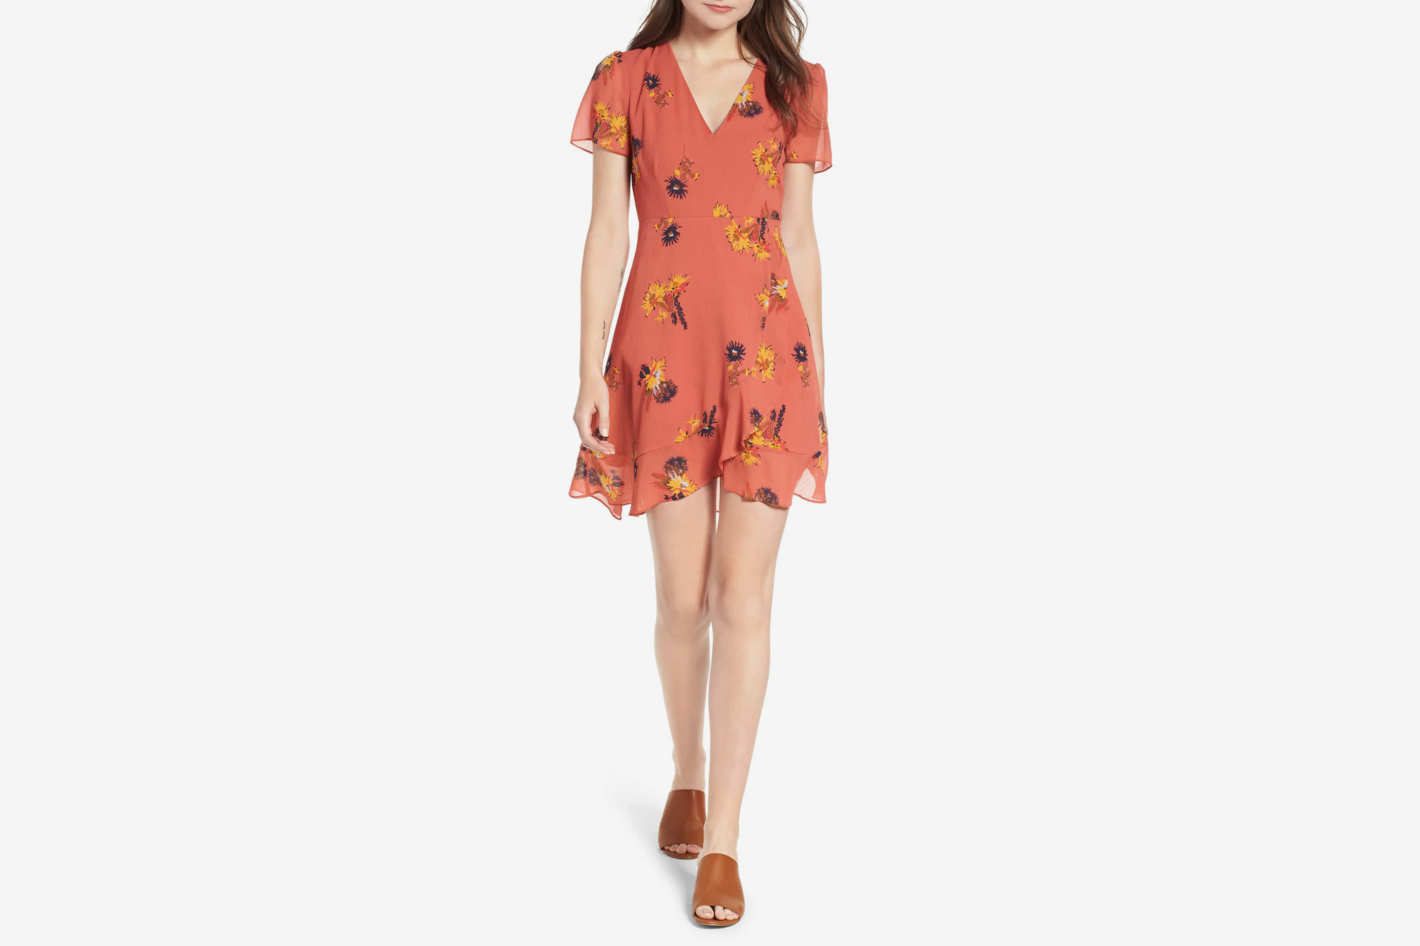 Madewell Posy Cactus Flower Dress